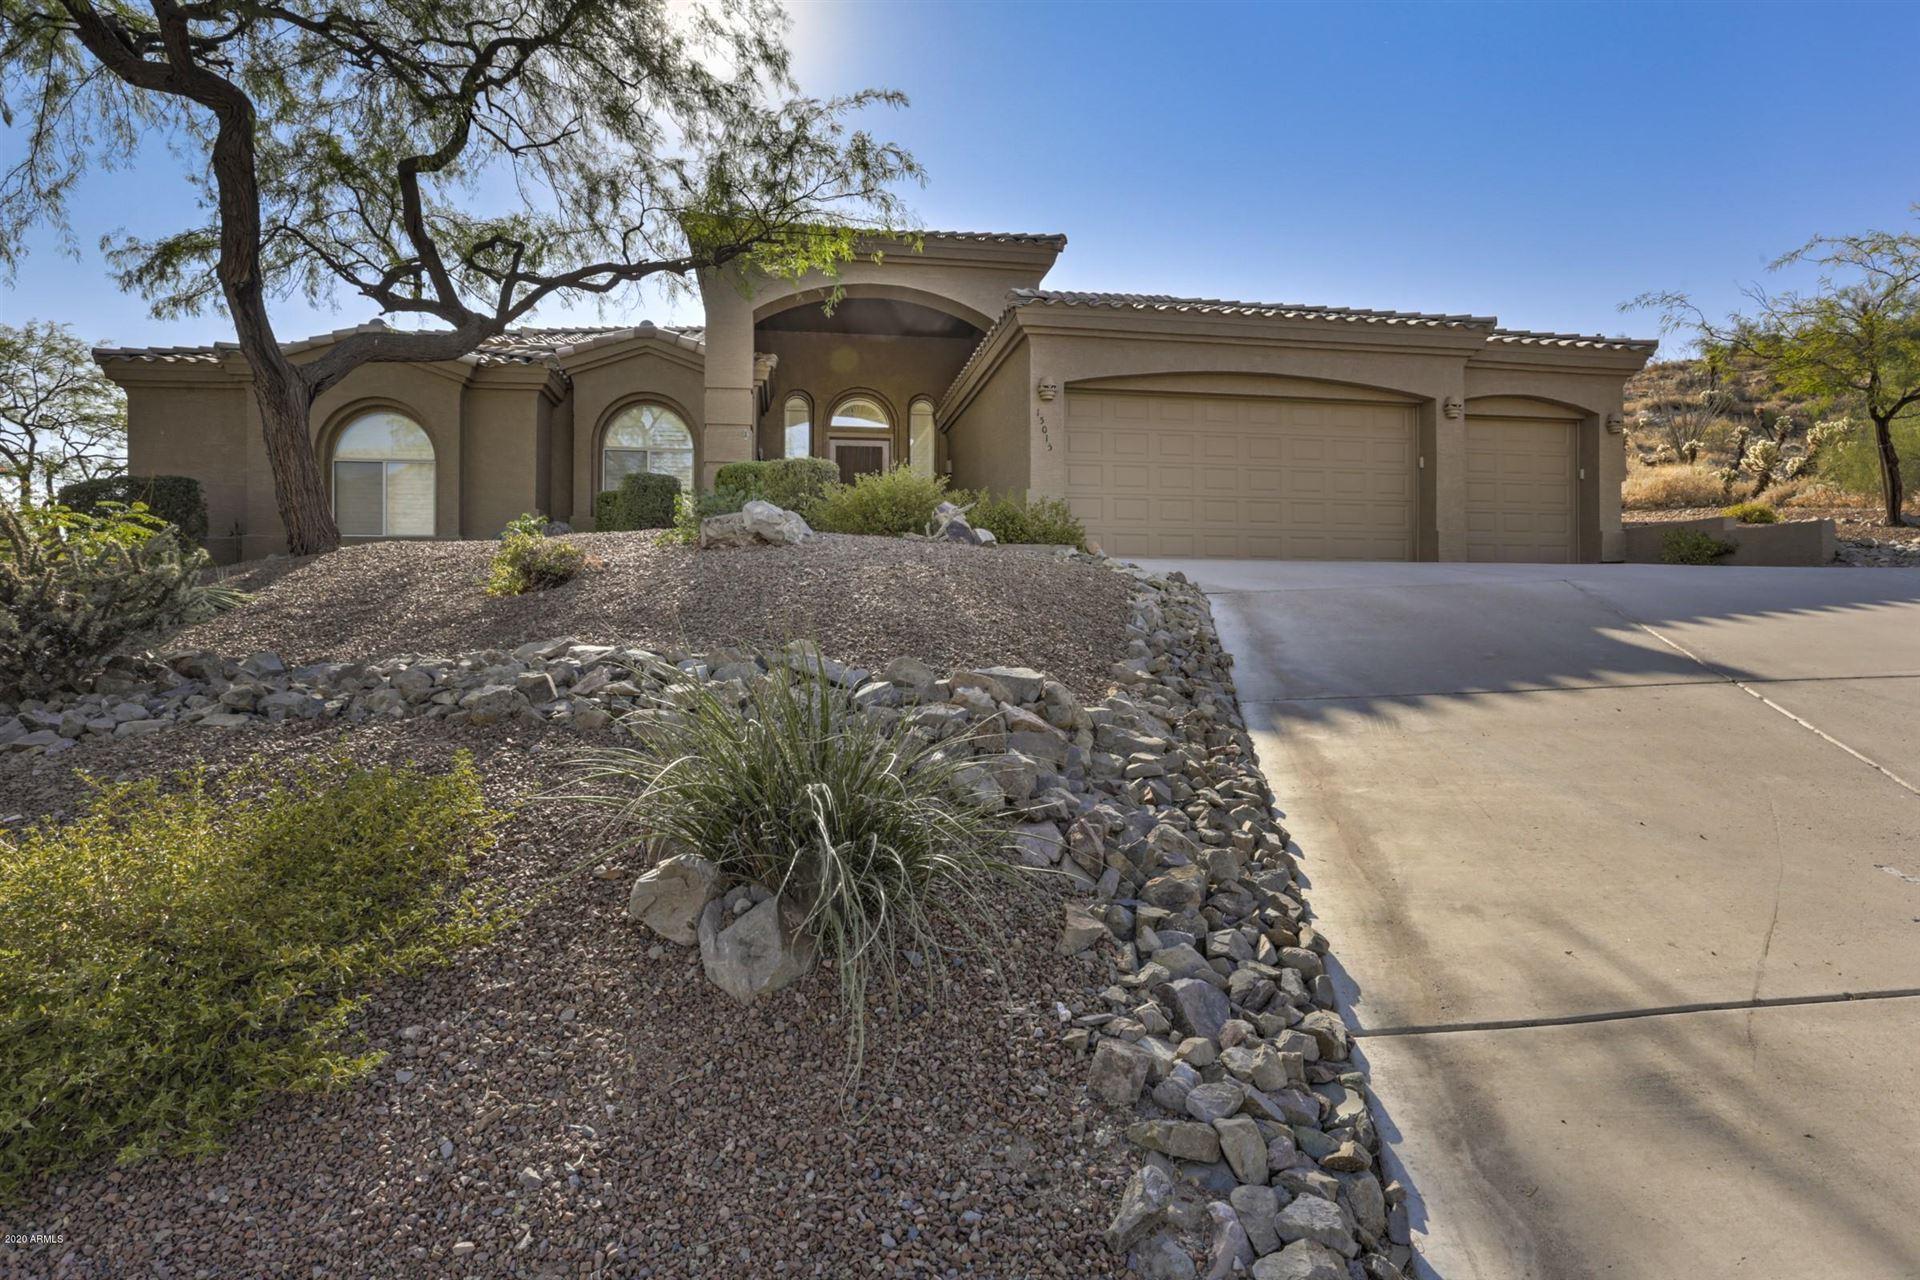 15015 E Zapata Drive, Fountain Hills, AZ 85268 - MLS#: 6128406